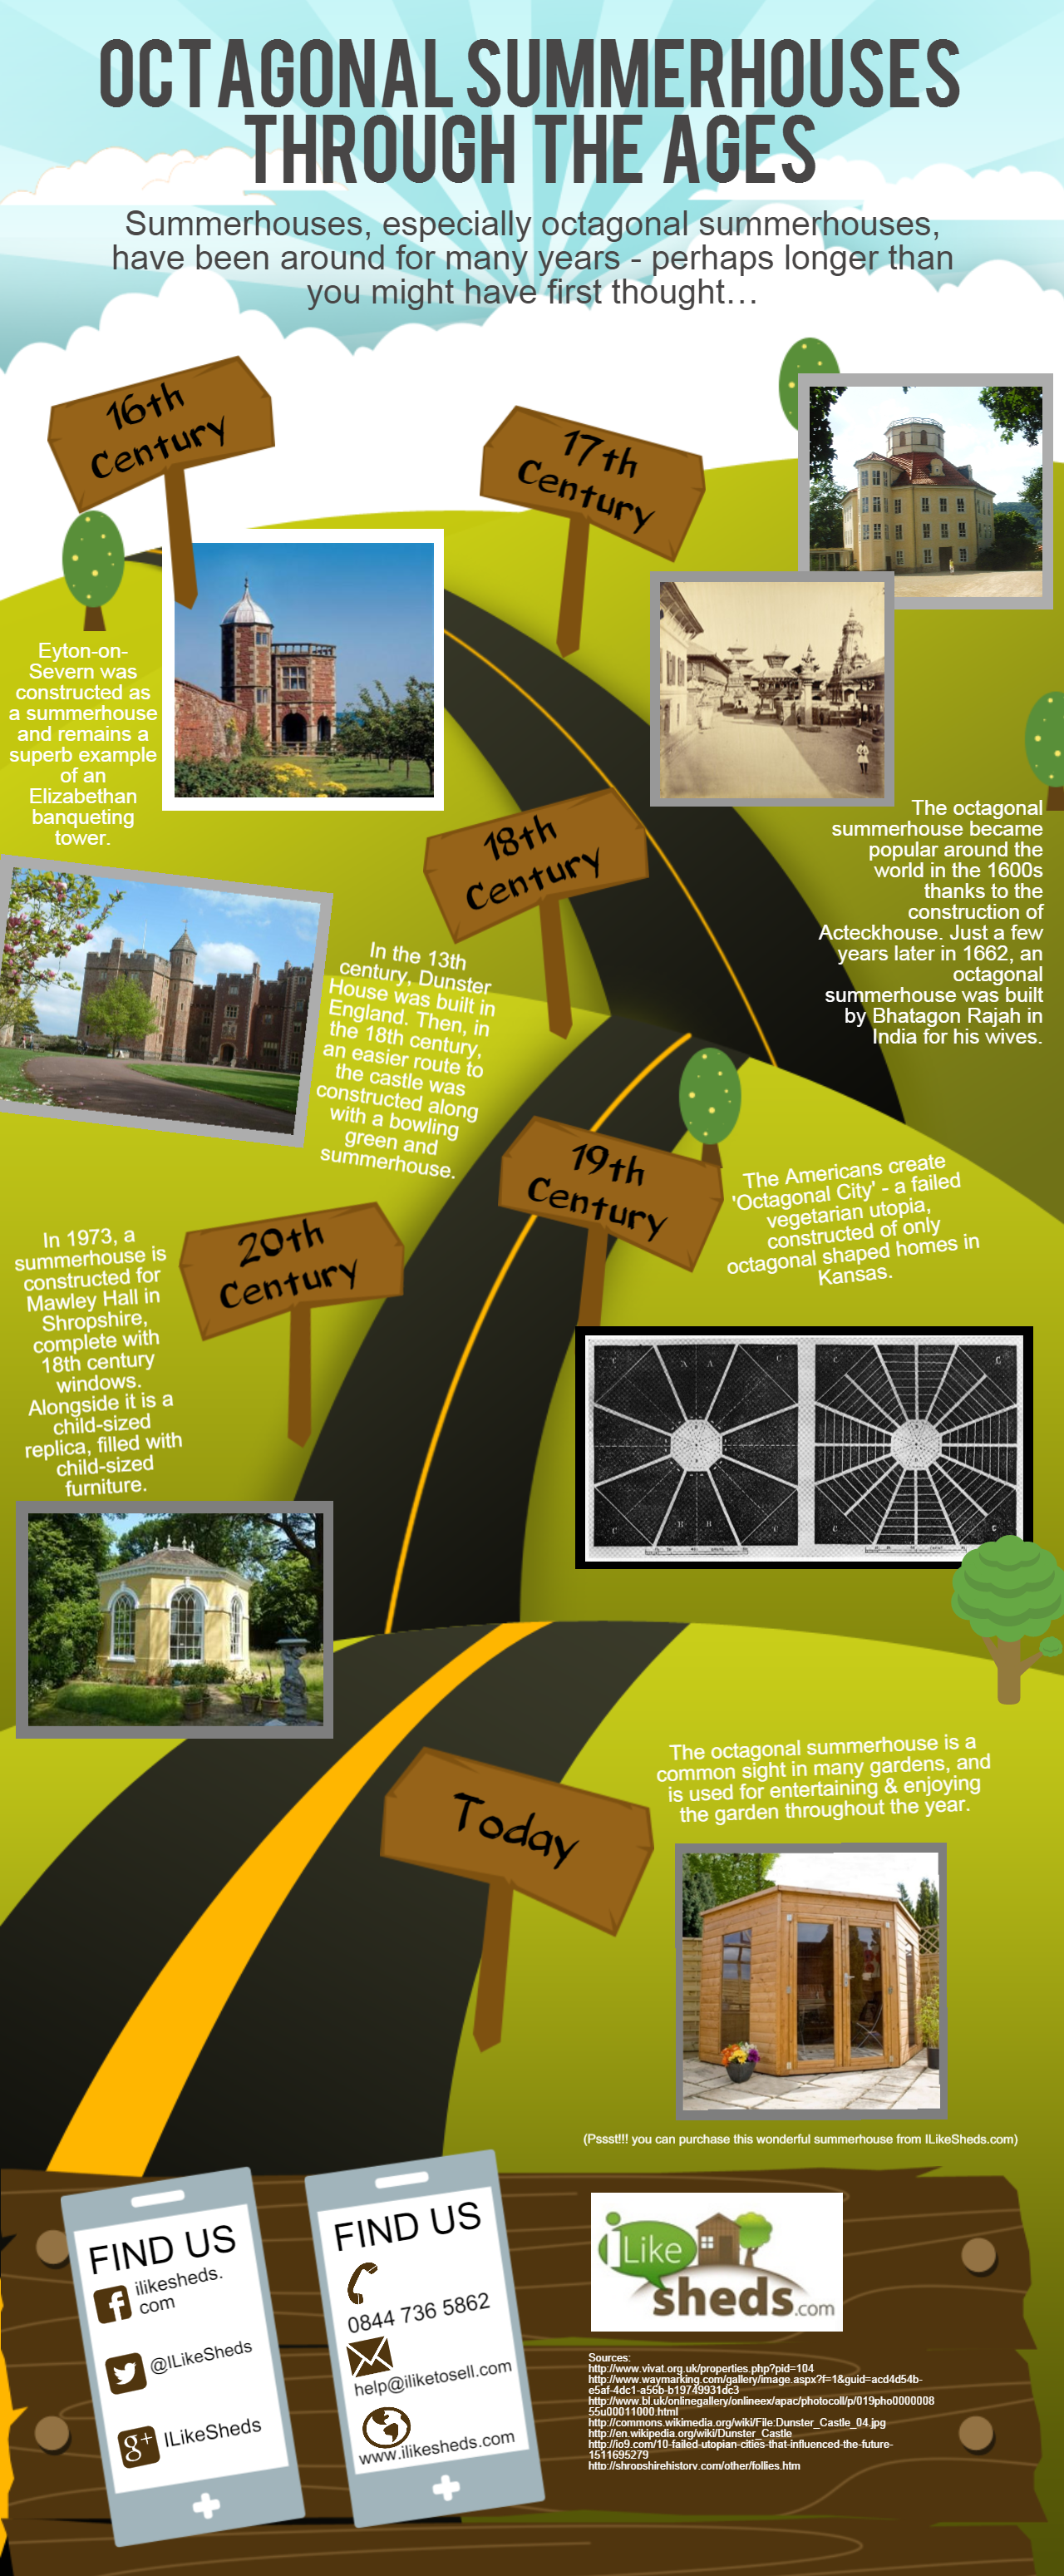 ILikeSheds Octagonal Summerhouses Infographic